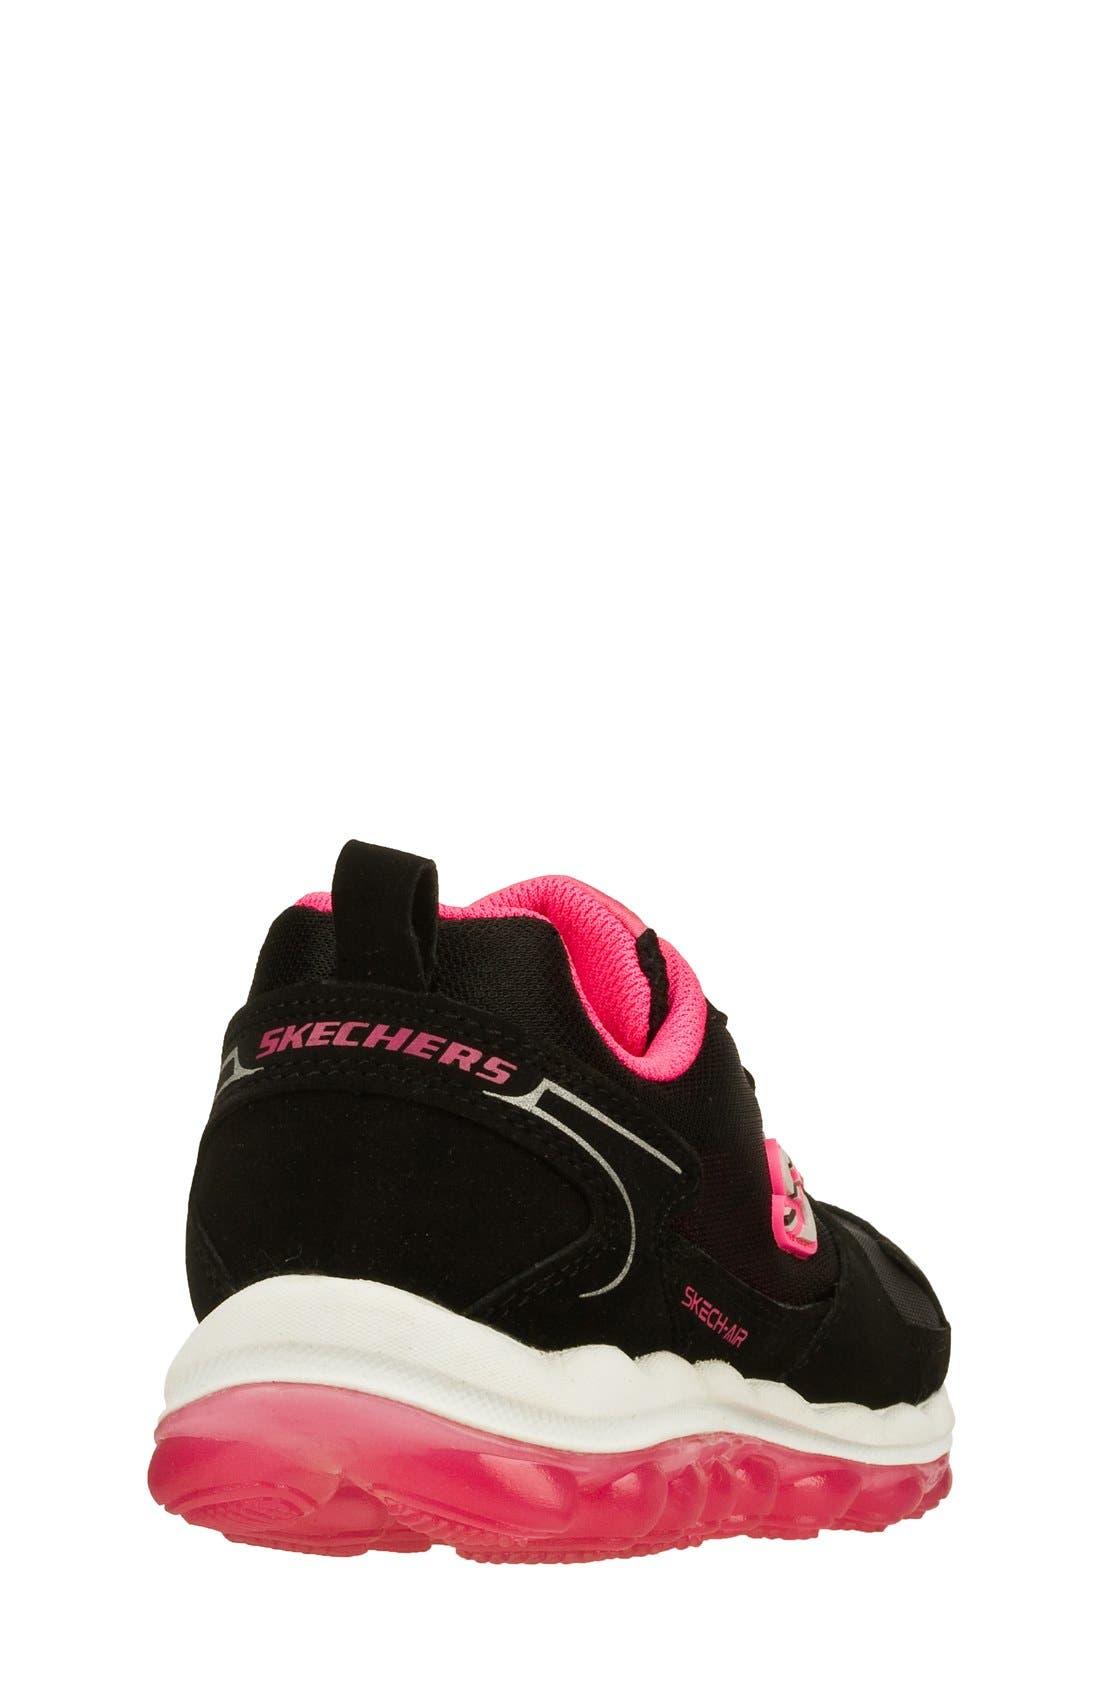 Alternate Image 2  - SKECHERS 'Skech Air - Bizzy Bounce' Sneaker (Toddler, Little Kid & Big Kid)